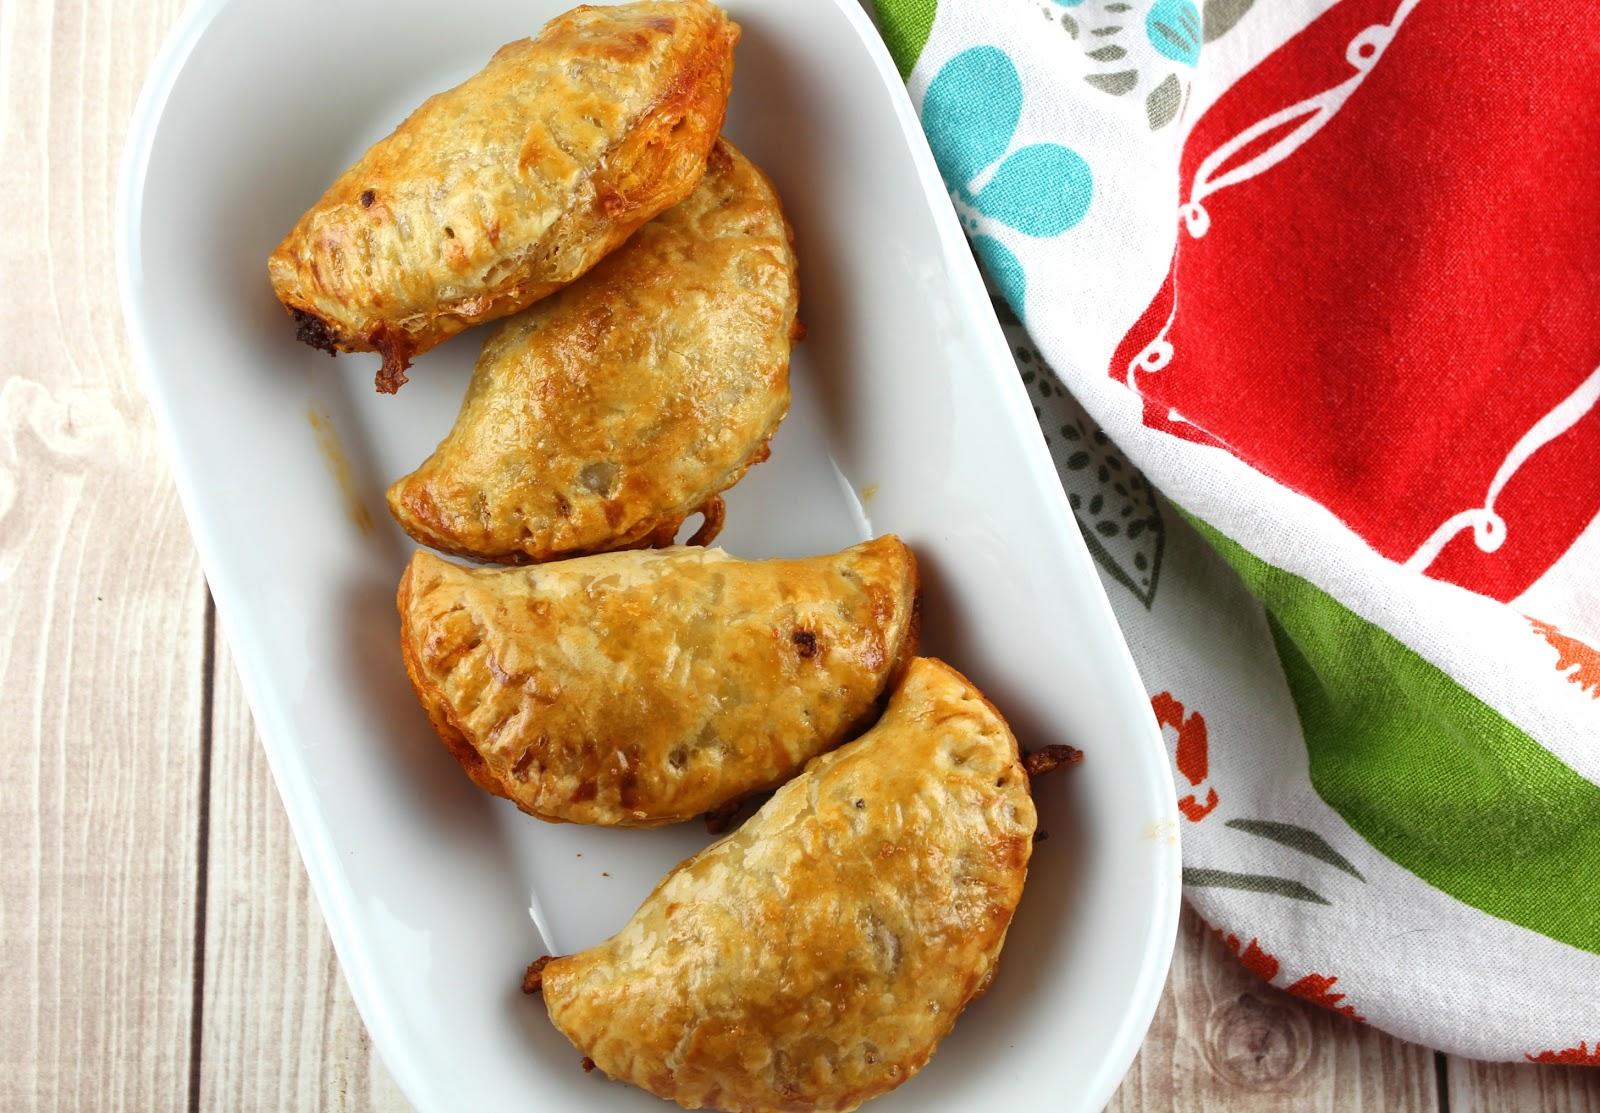 chorizo and cheese empanadas - easy weeknight meal